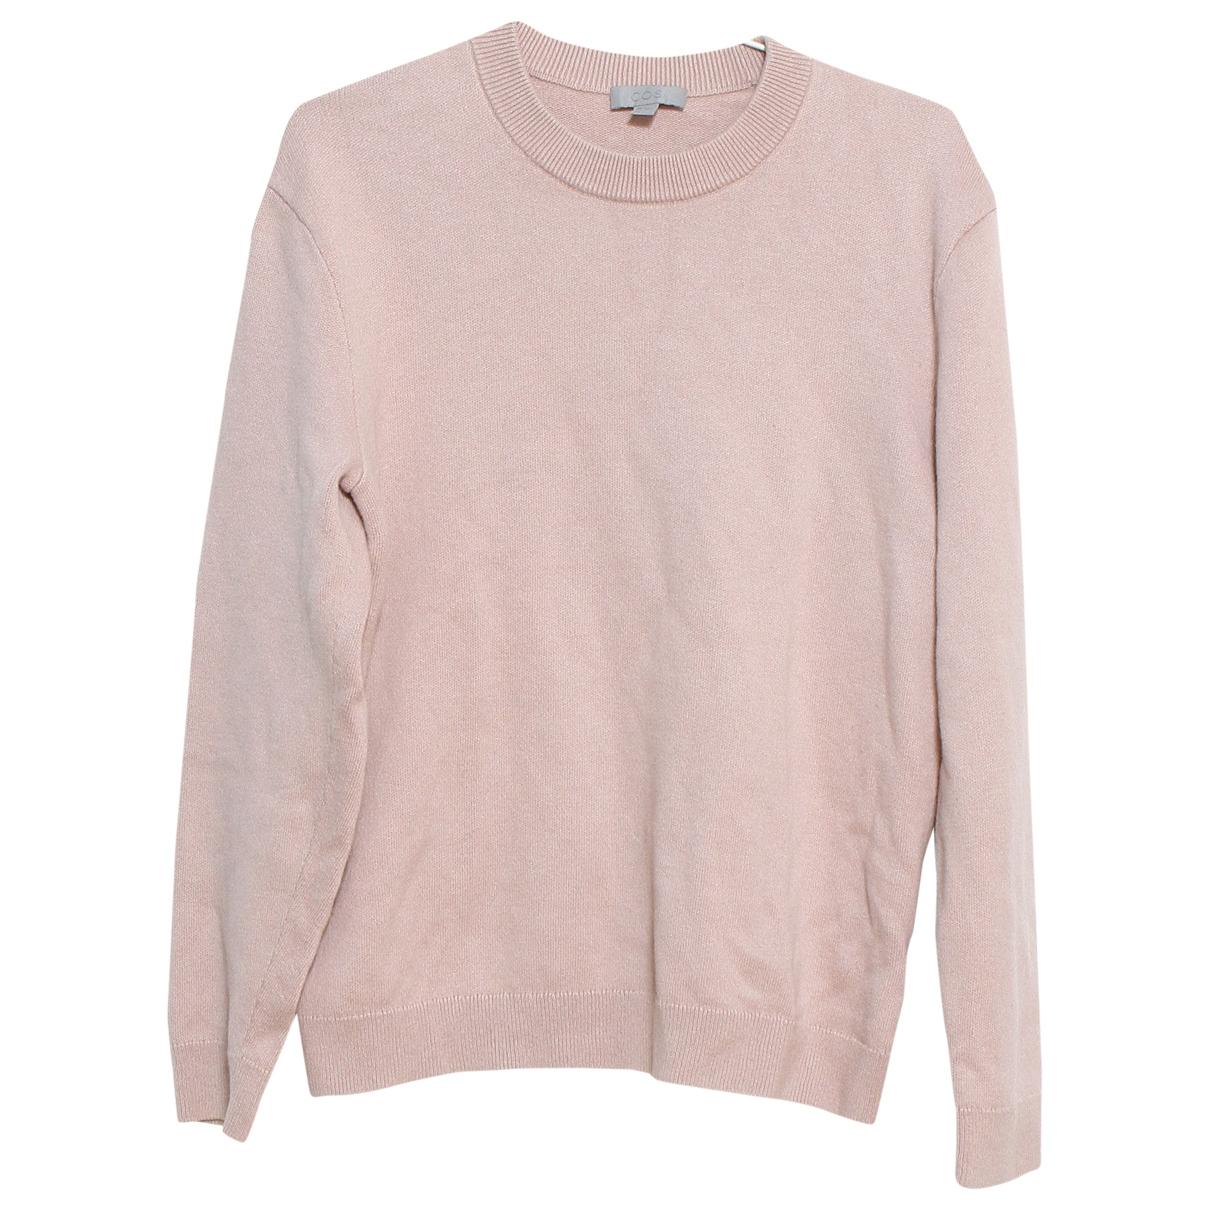 Cos \N Pink Cotton Knitwear & Sweatshirts for Men S International